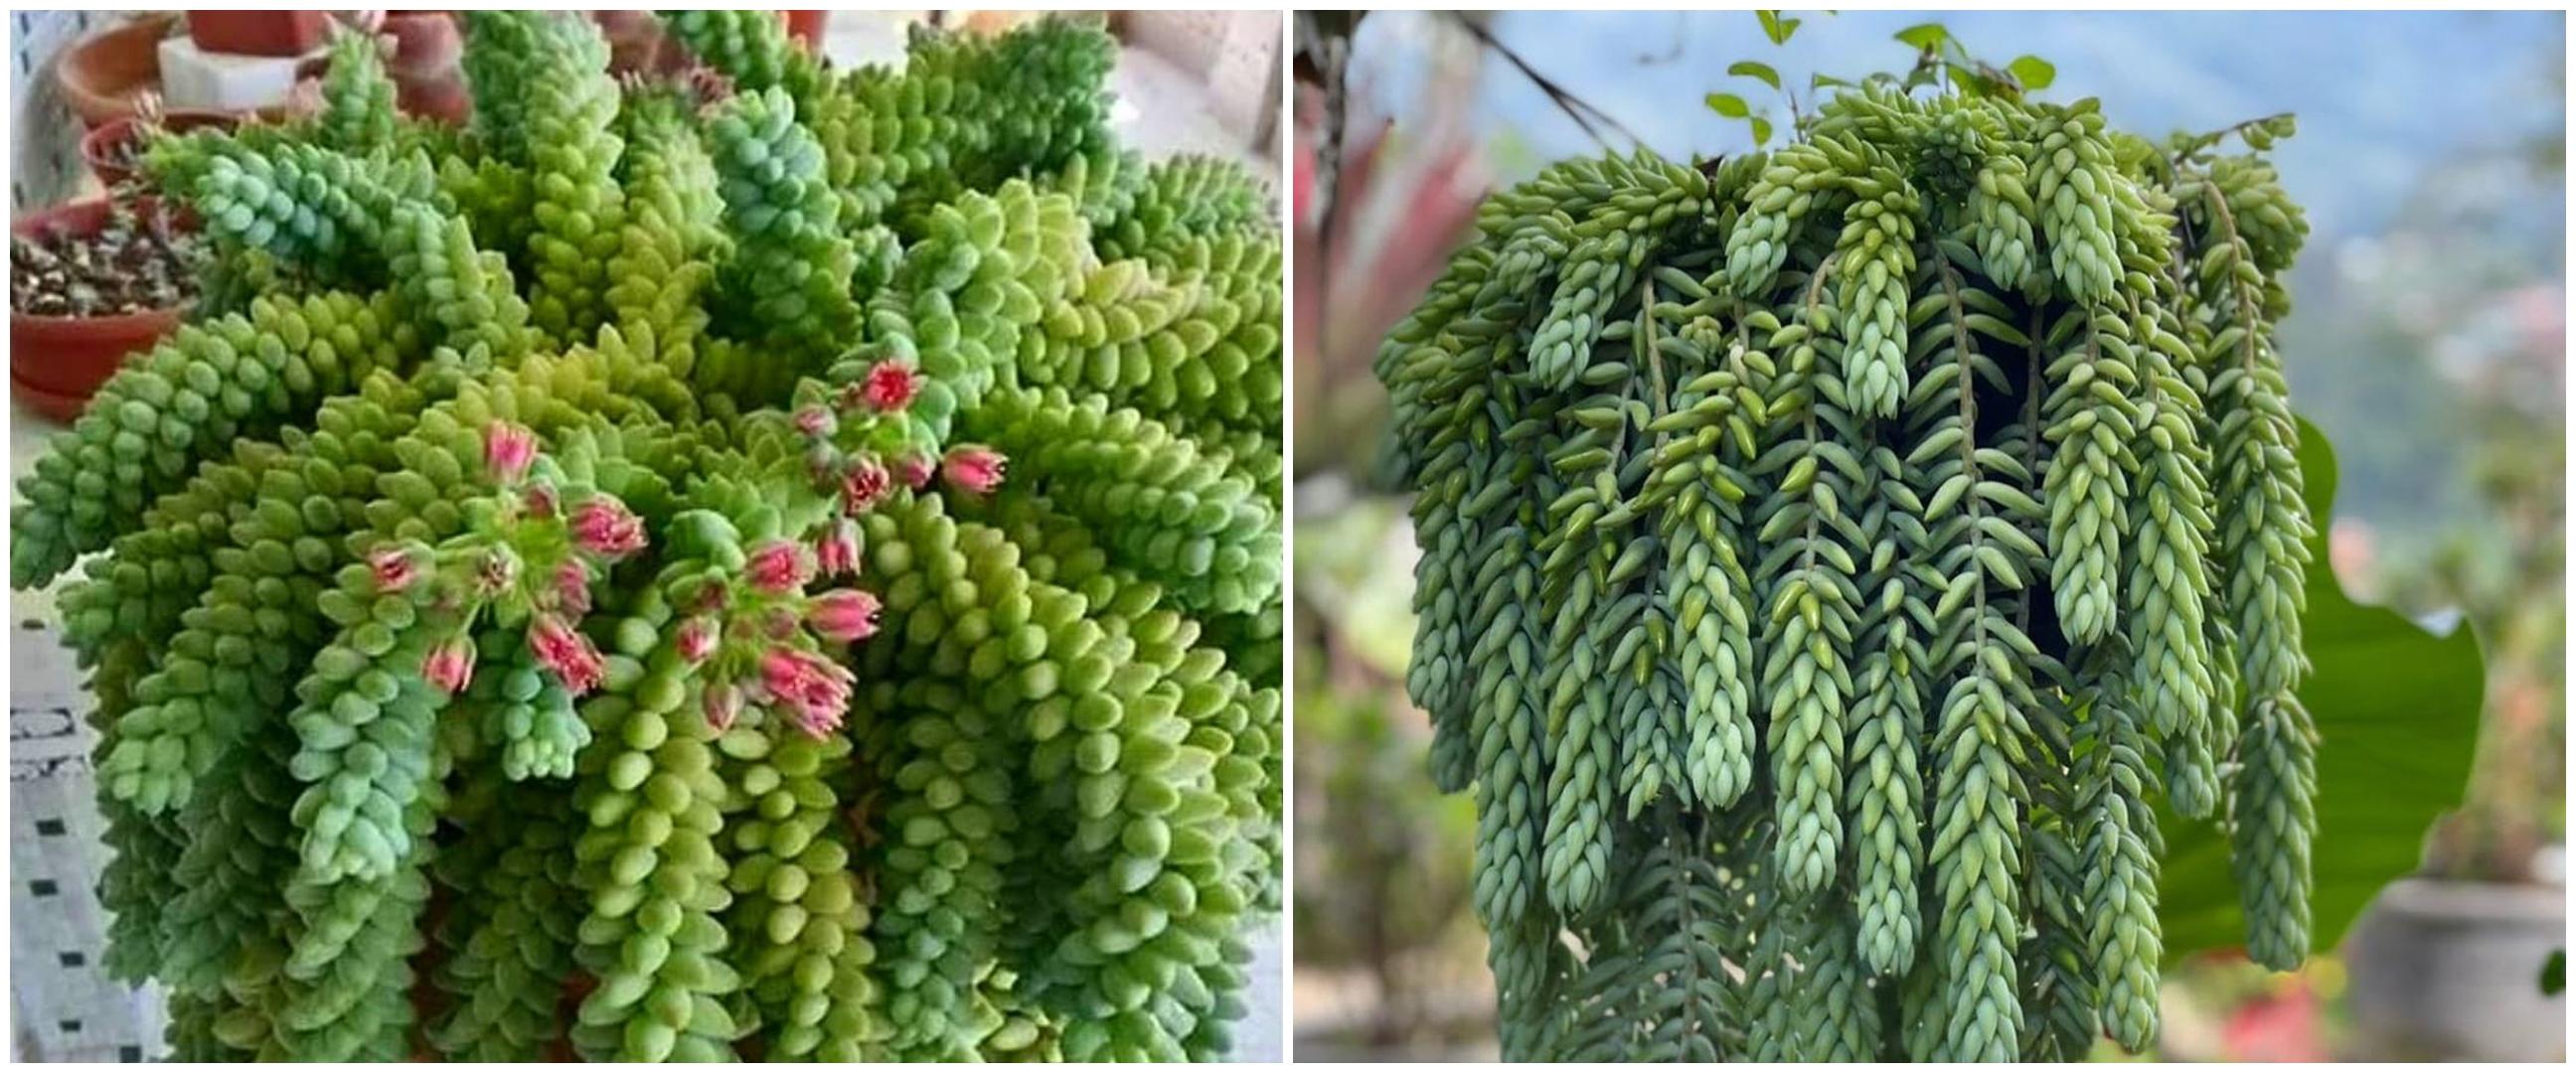 Cara merawat tanaman hias gantung kaktus anggur, rimbun dan cantik